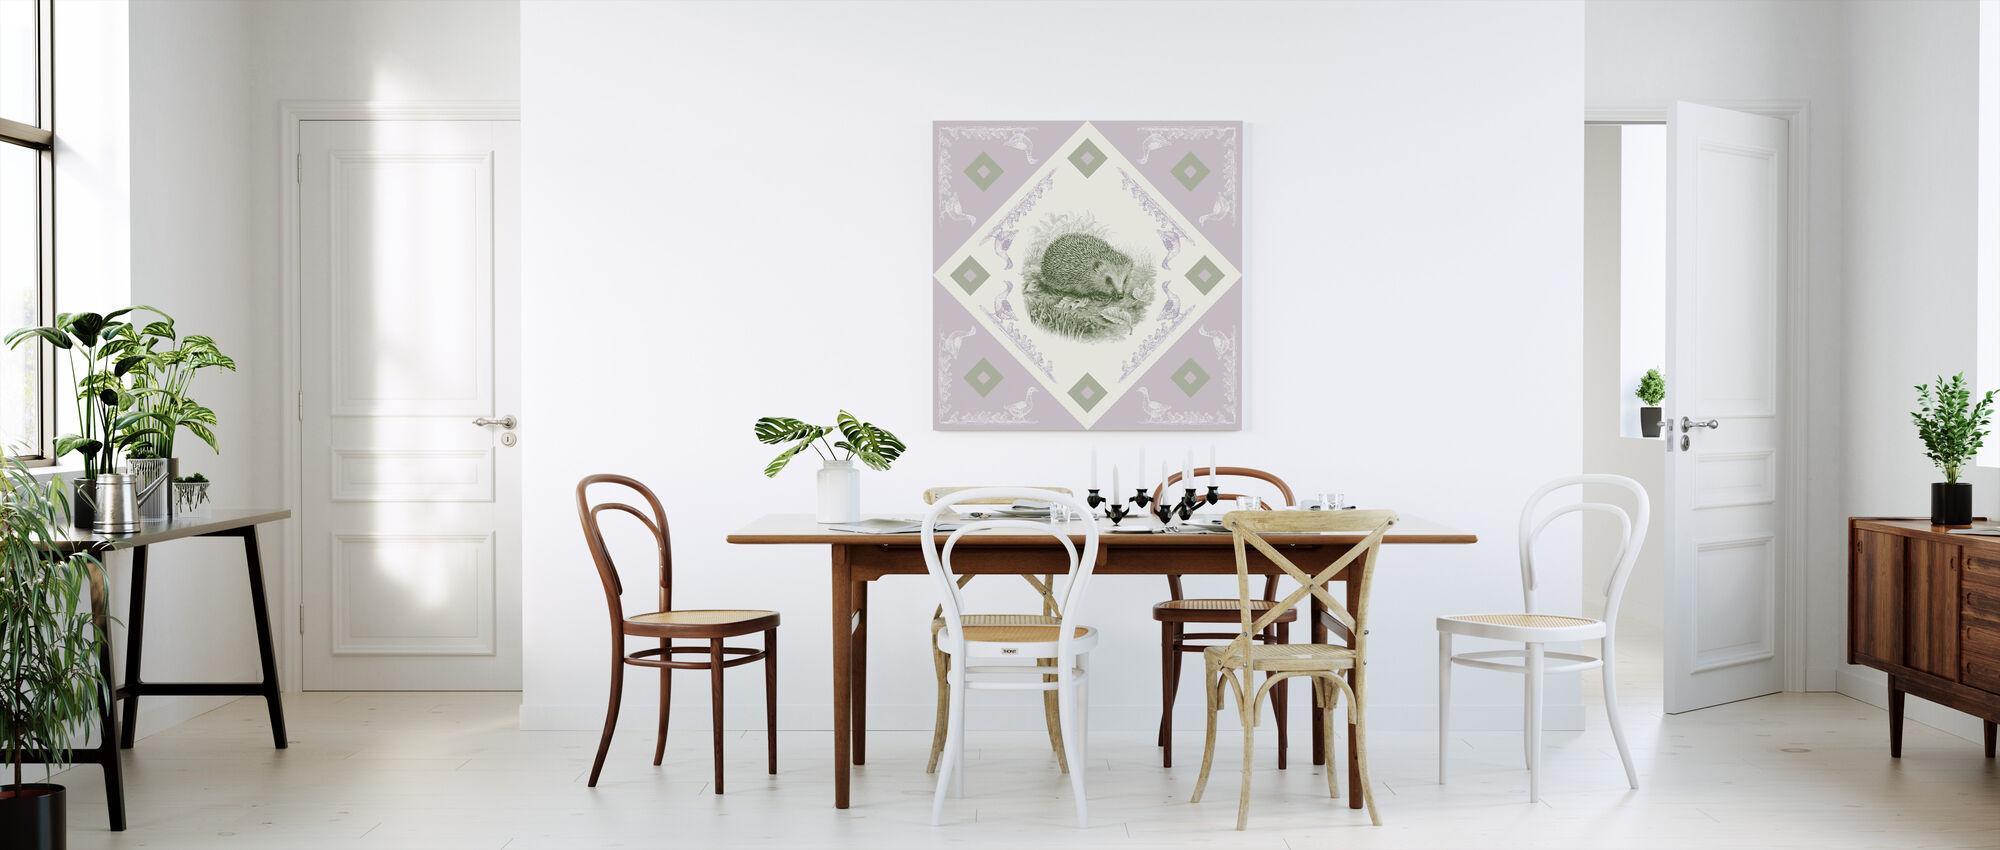 Egel, Groen Paarse - Canvas print - Keuken